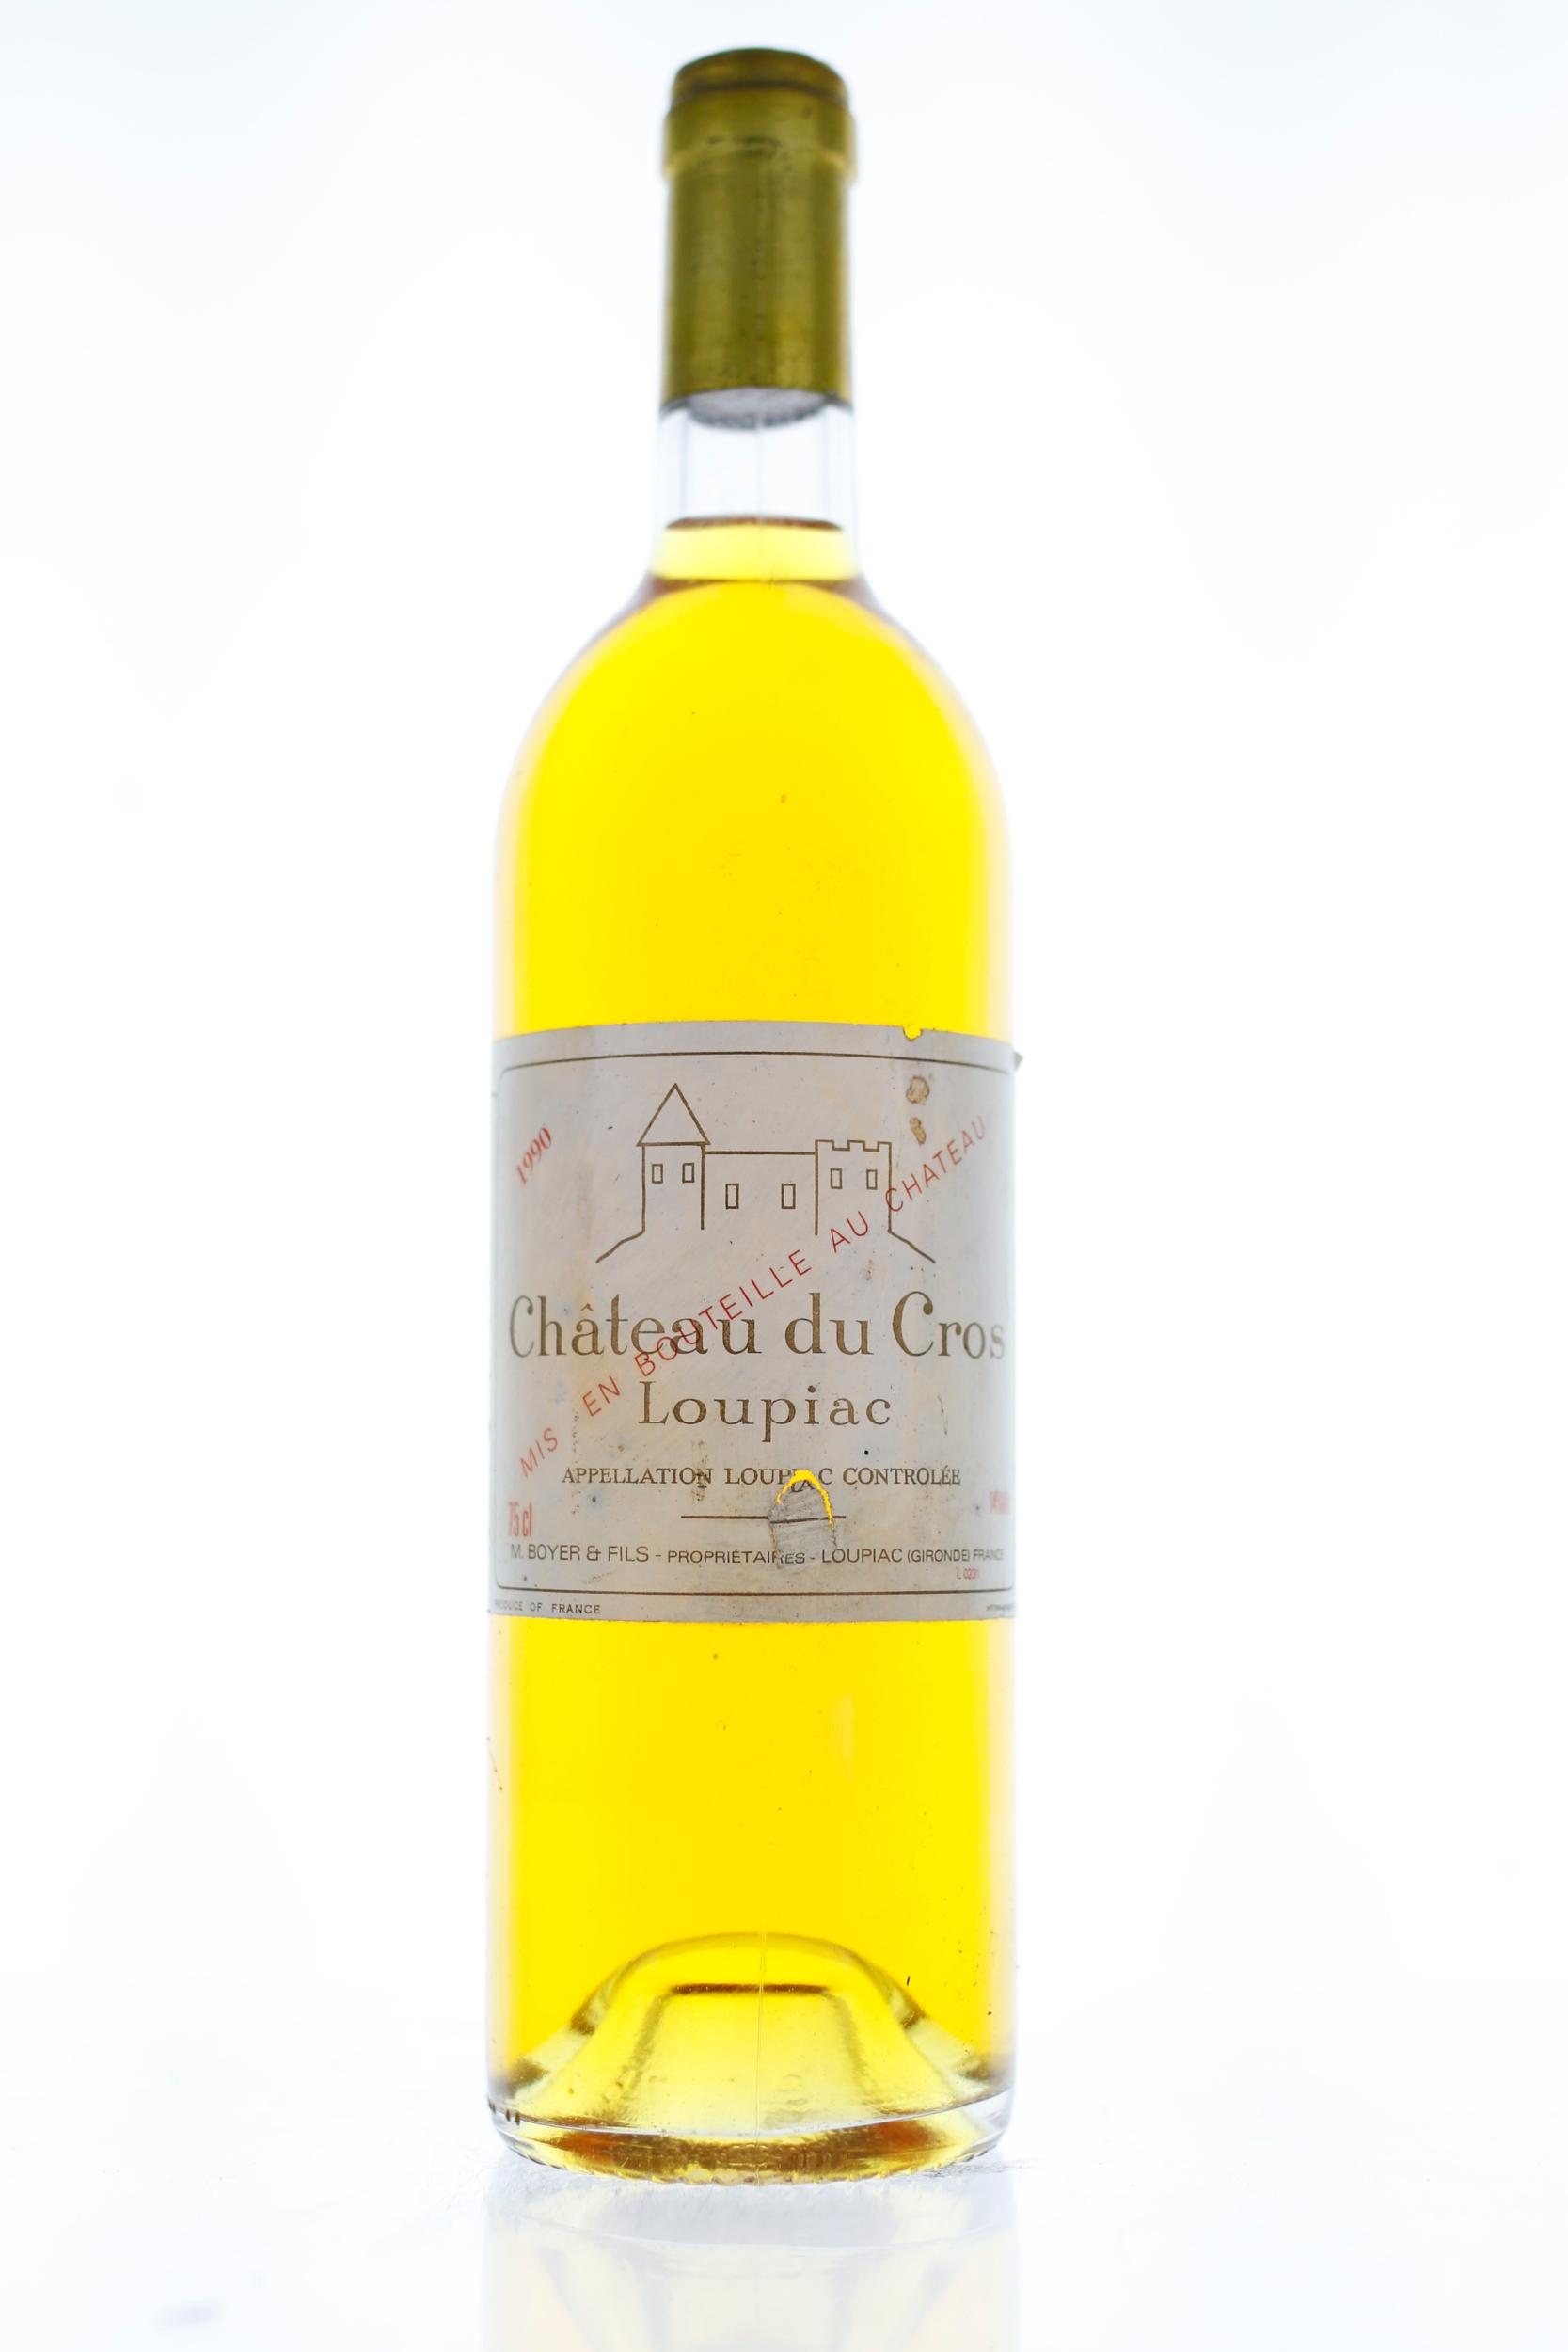 Loupiac - Château du Cros - 1990